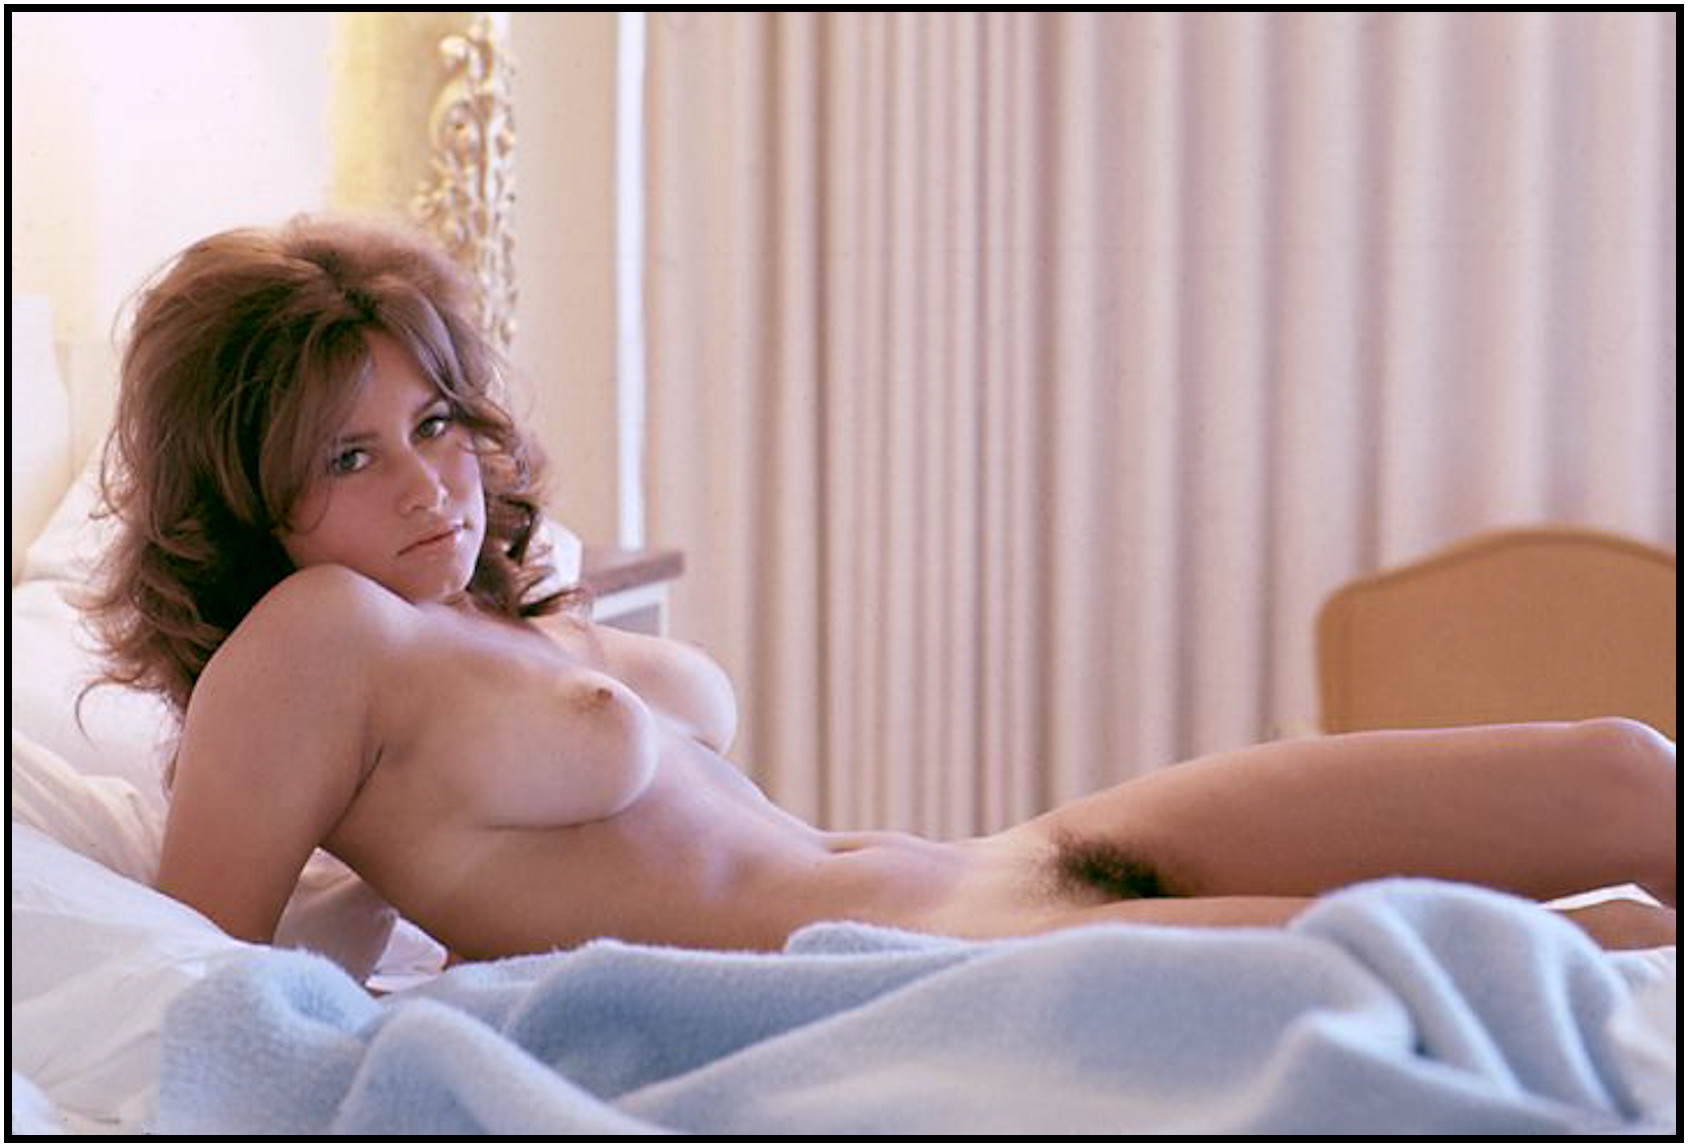 Vanessa lane porno maduras, top rated